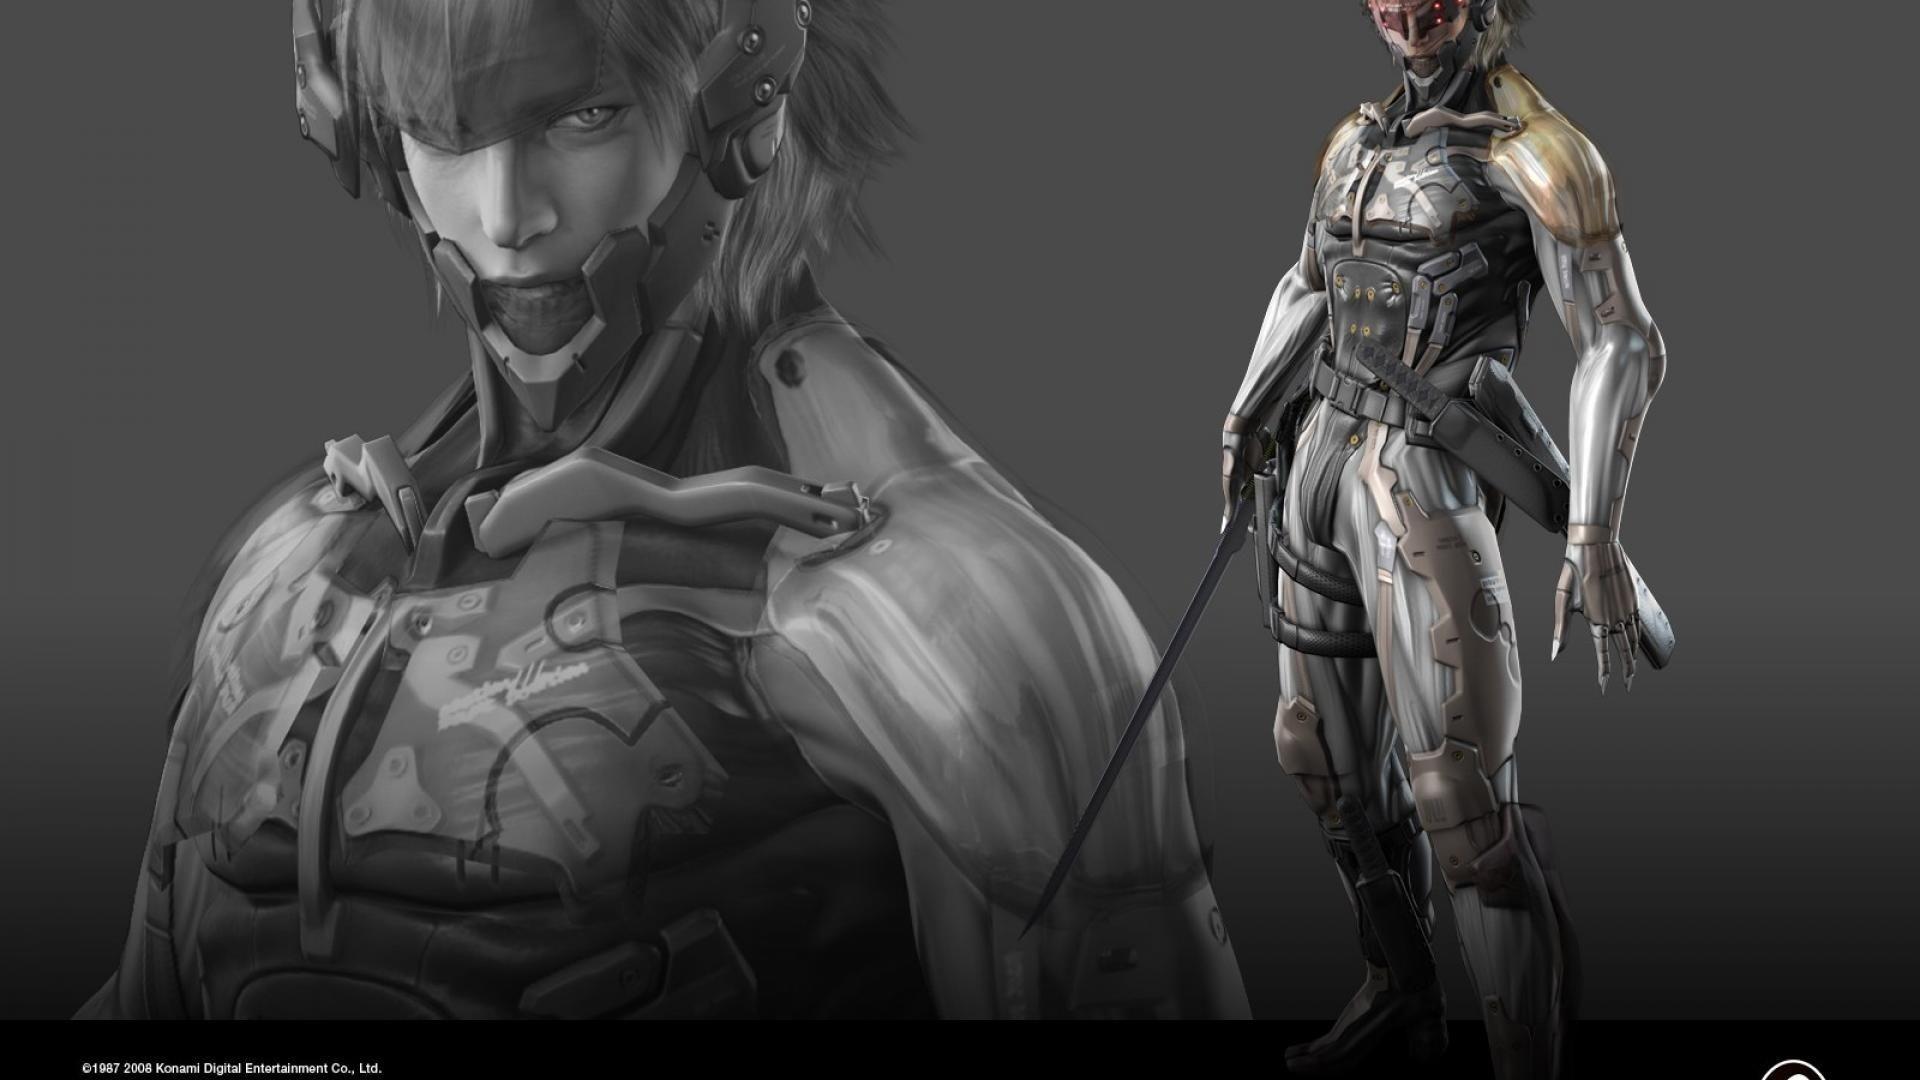 metal gear solid rising 3d games hd wallpaper – (#28120) – HQ .